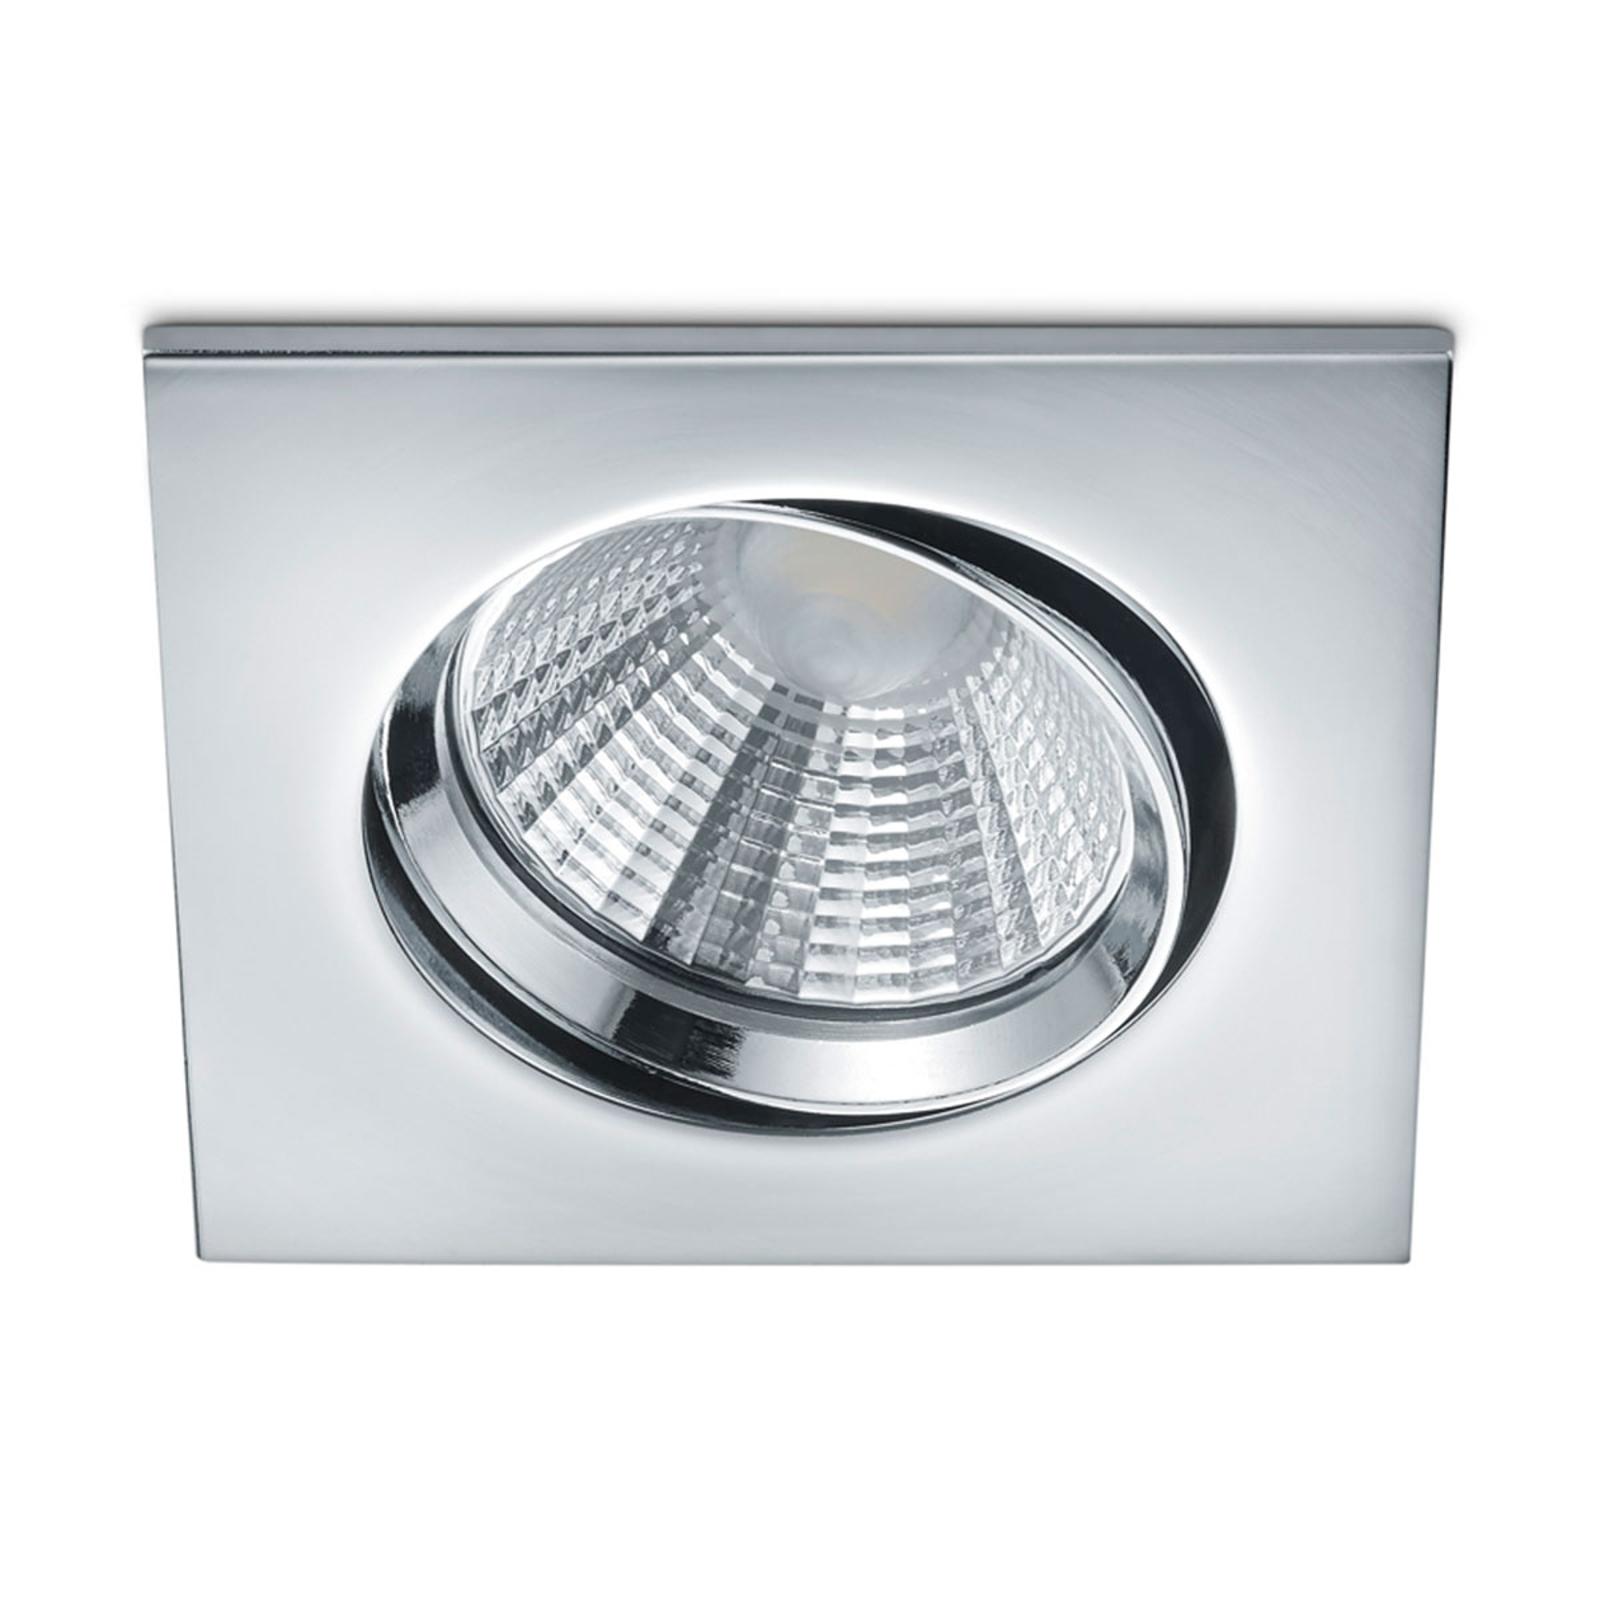 Dimbare LED inbouwspot Pamir in chroom